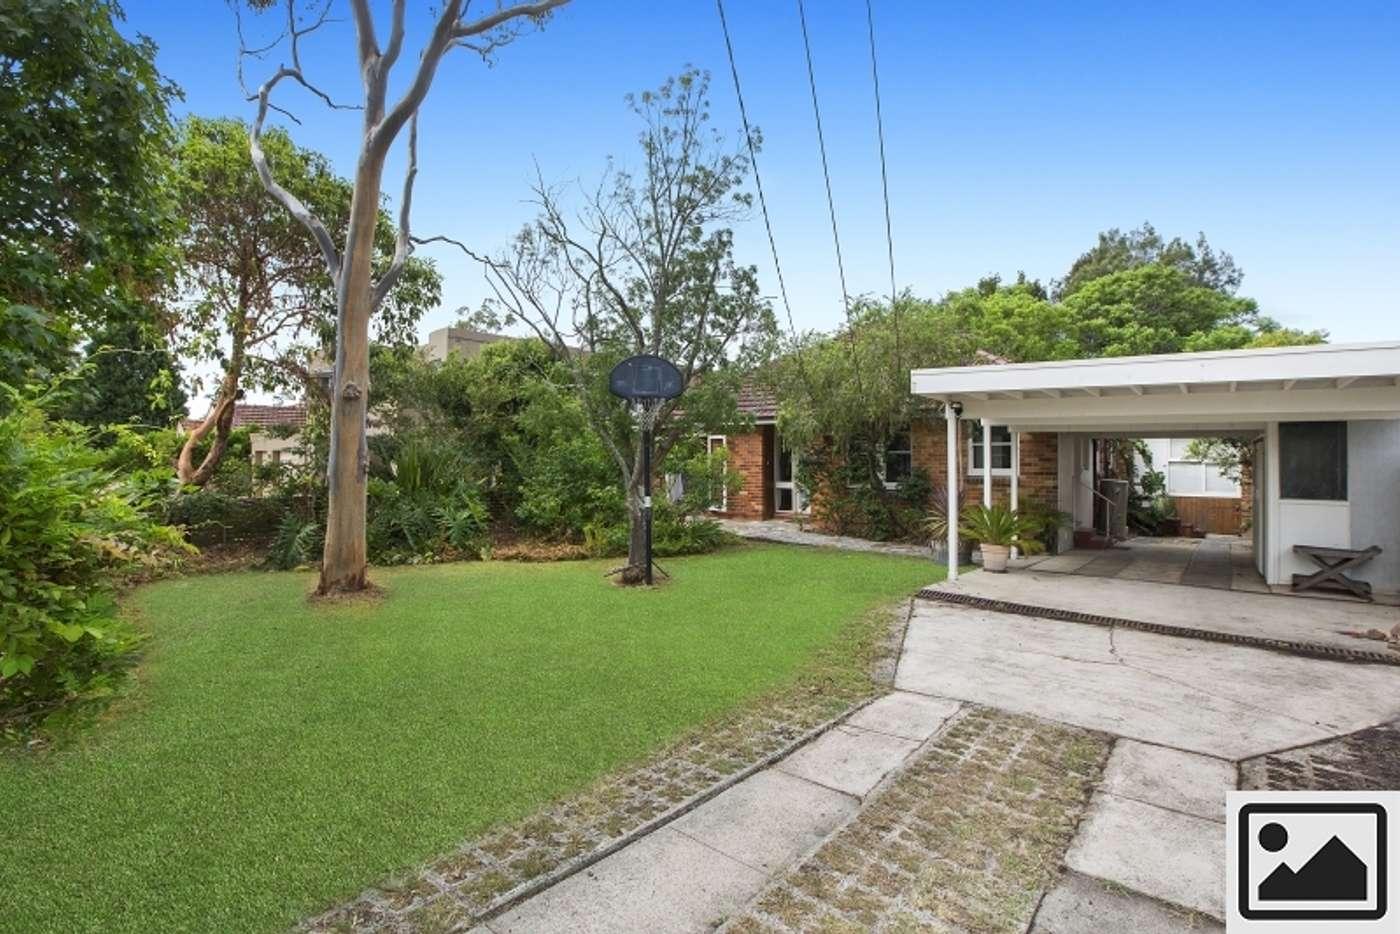 Main view of Homely house listing, 9 Yirgella Avenue, East Killara NSW 2071